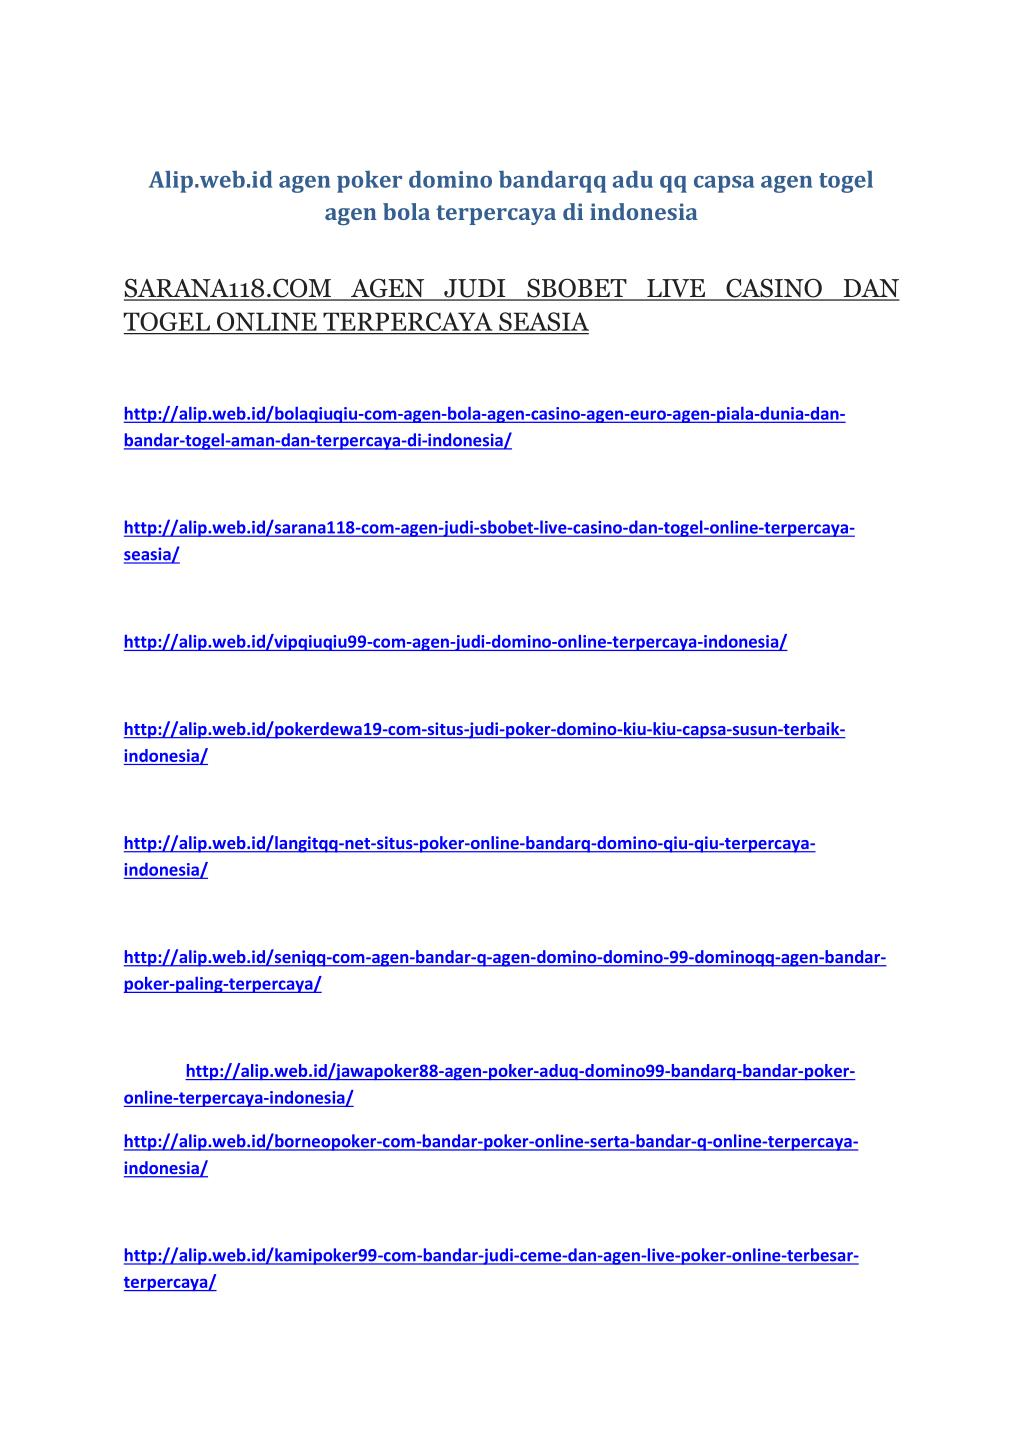 Ppt Agen Poker Aduq Domino99 Bandarq Bandar Poker Online Terpercaya Indonesia Powerpoint Presentation Id 7574743